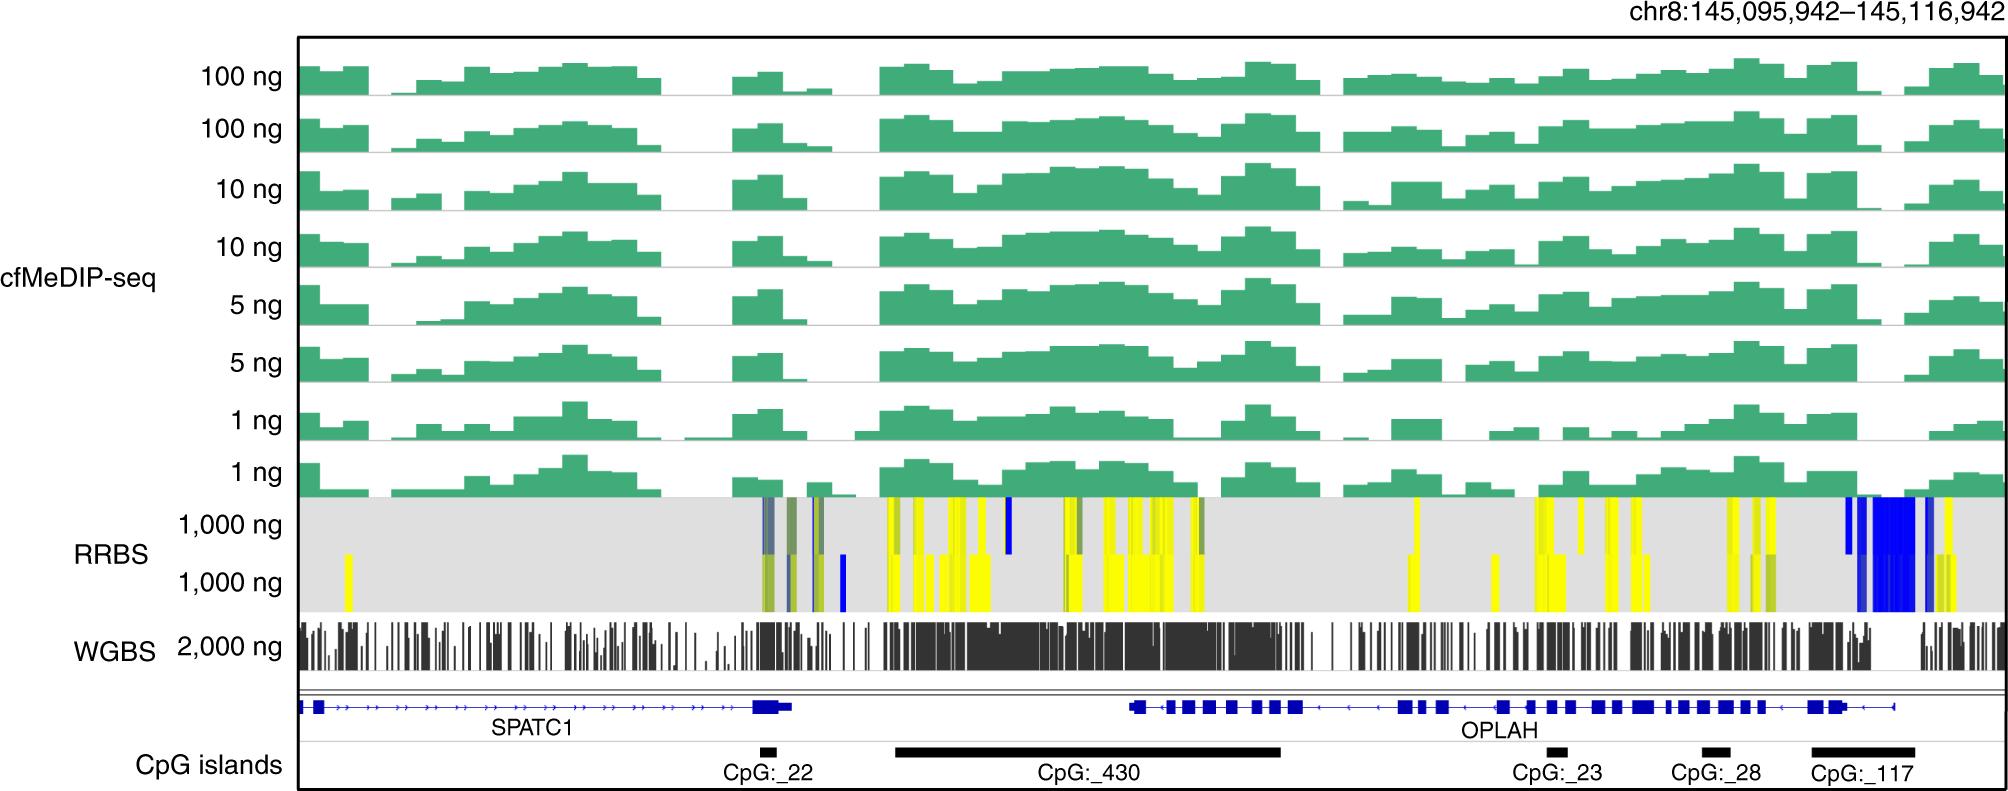 Preparation of cfMeDIP-seq libraries for methylome profiling of plasma